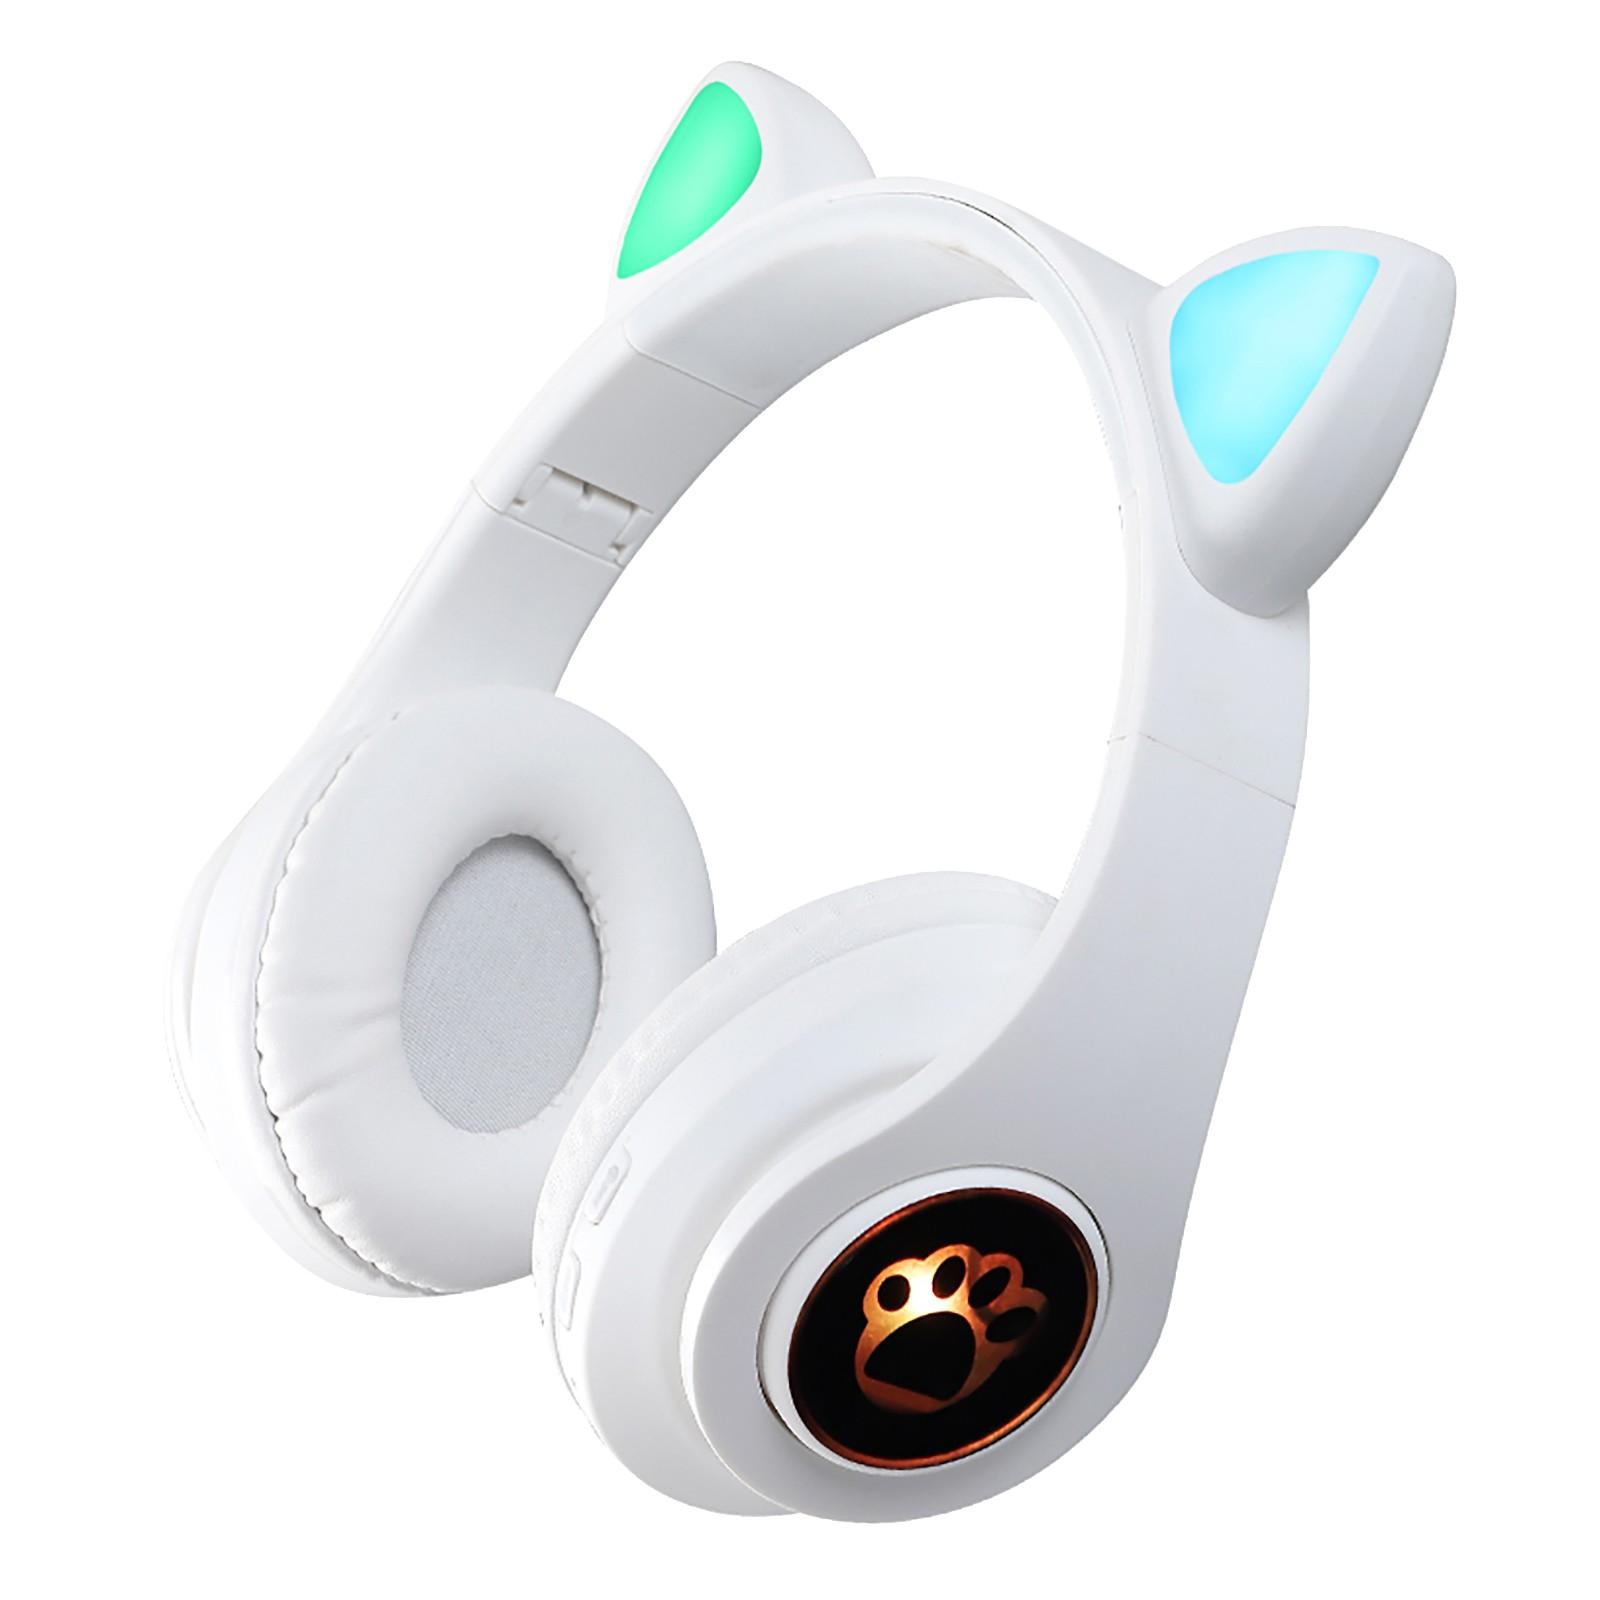 Gaming Earphones B39 Cat Ear Wireless 5.0 Luminous Noise Gaming Headset Bluetooth-compatible Headphones White